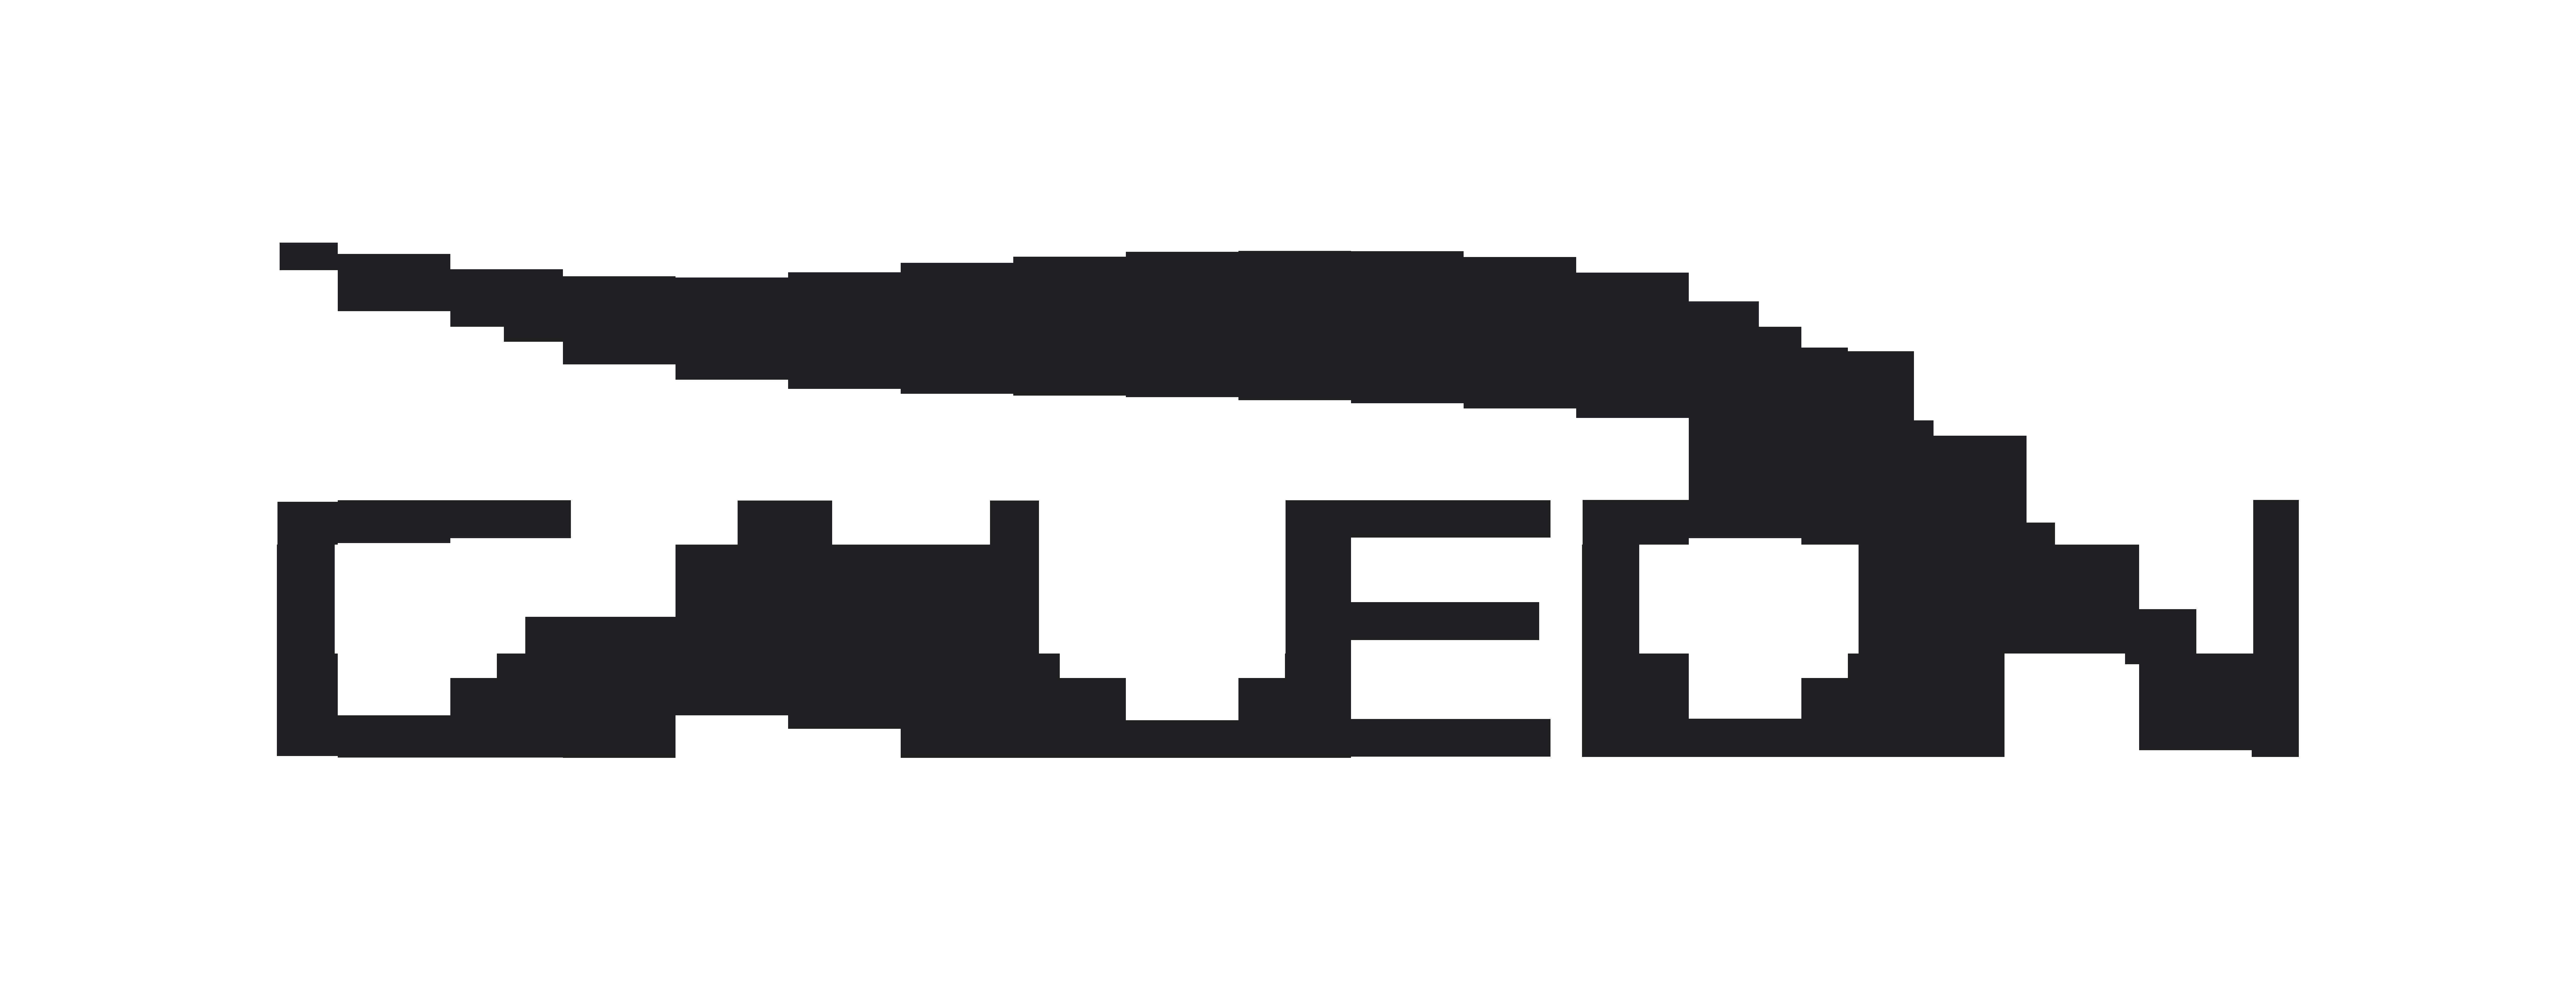 Galeon logo